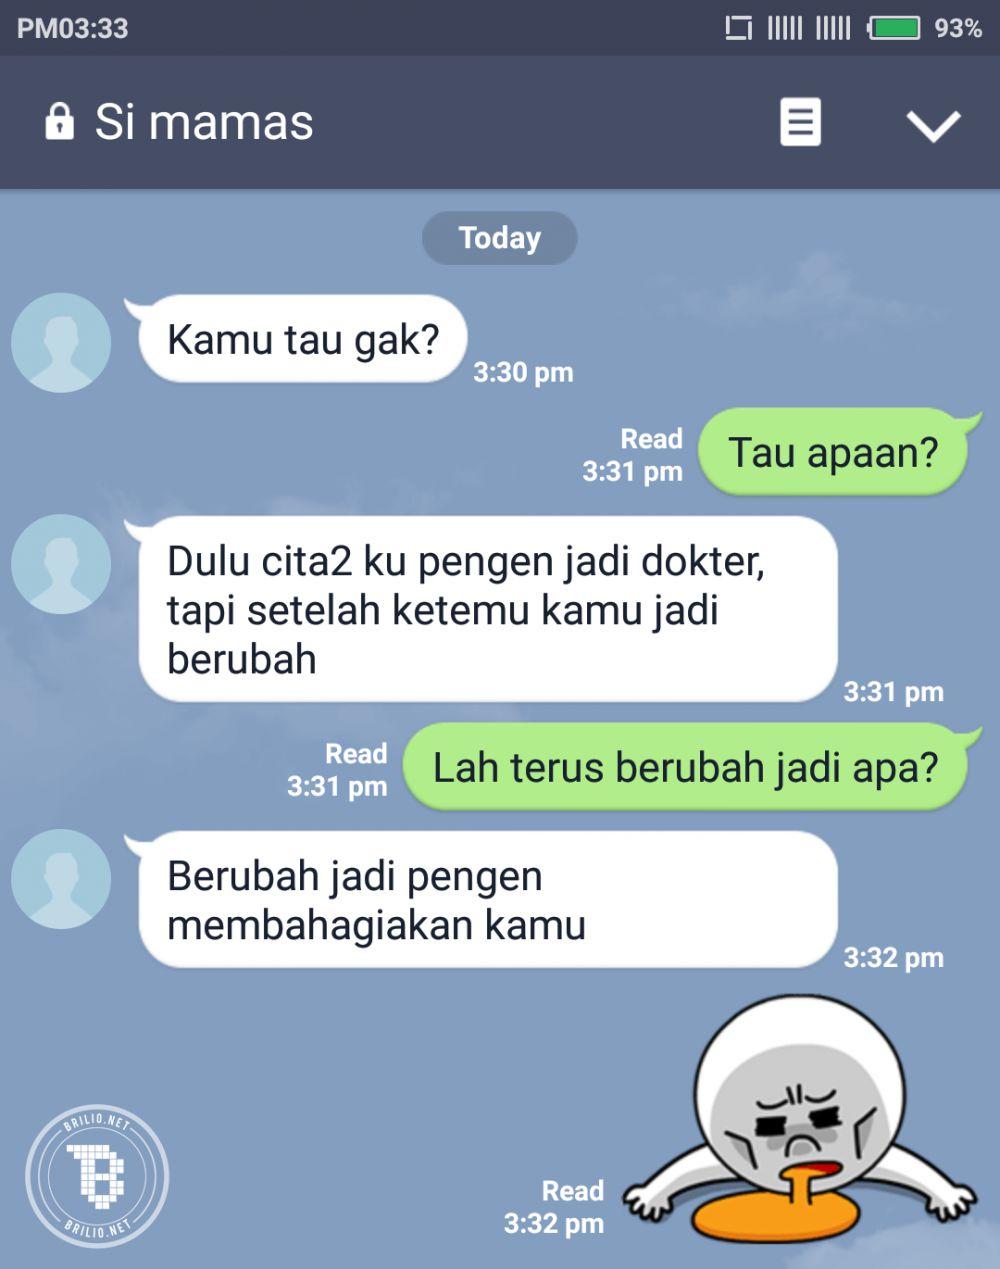 Kumpulan Gambar Chat Lucu Gagal Gombal